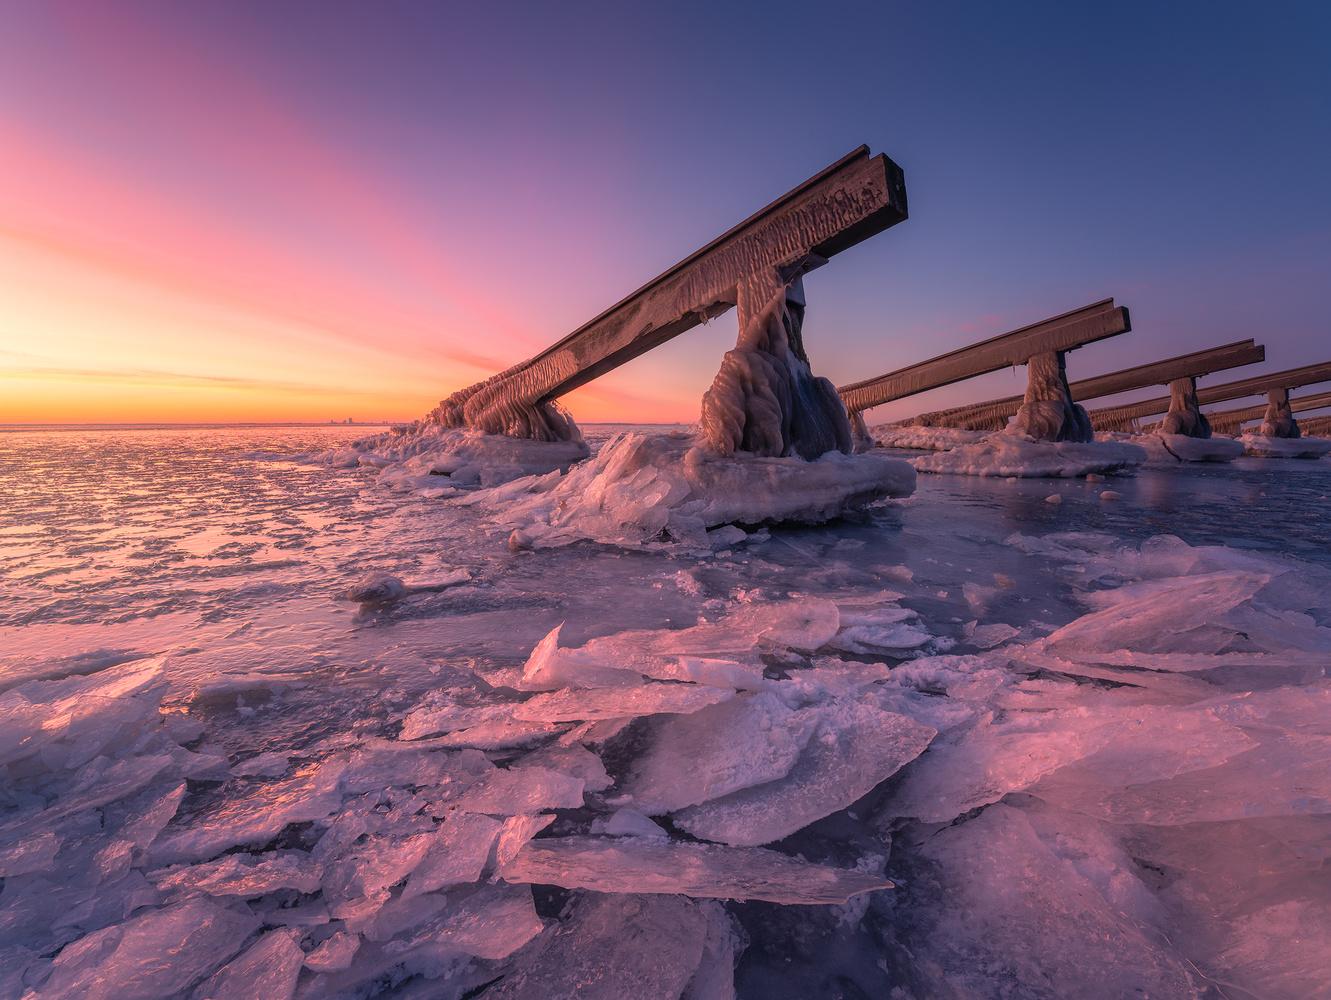 Arctic Feelings by Vincent Fennis